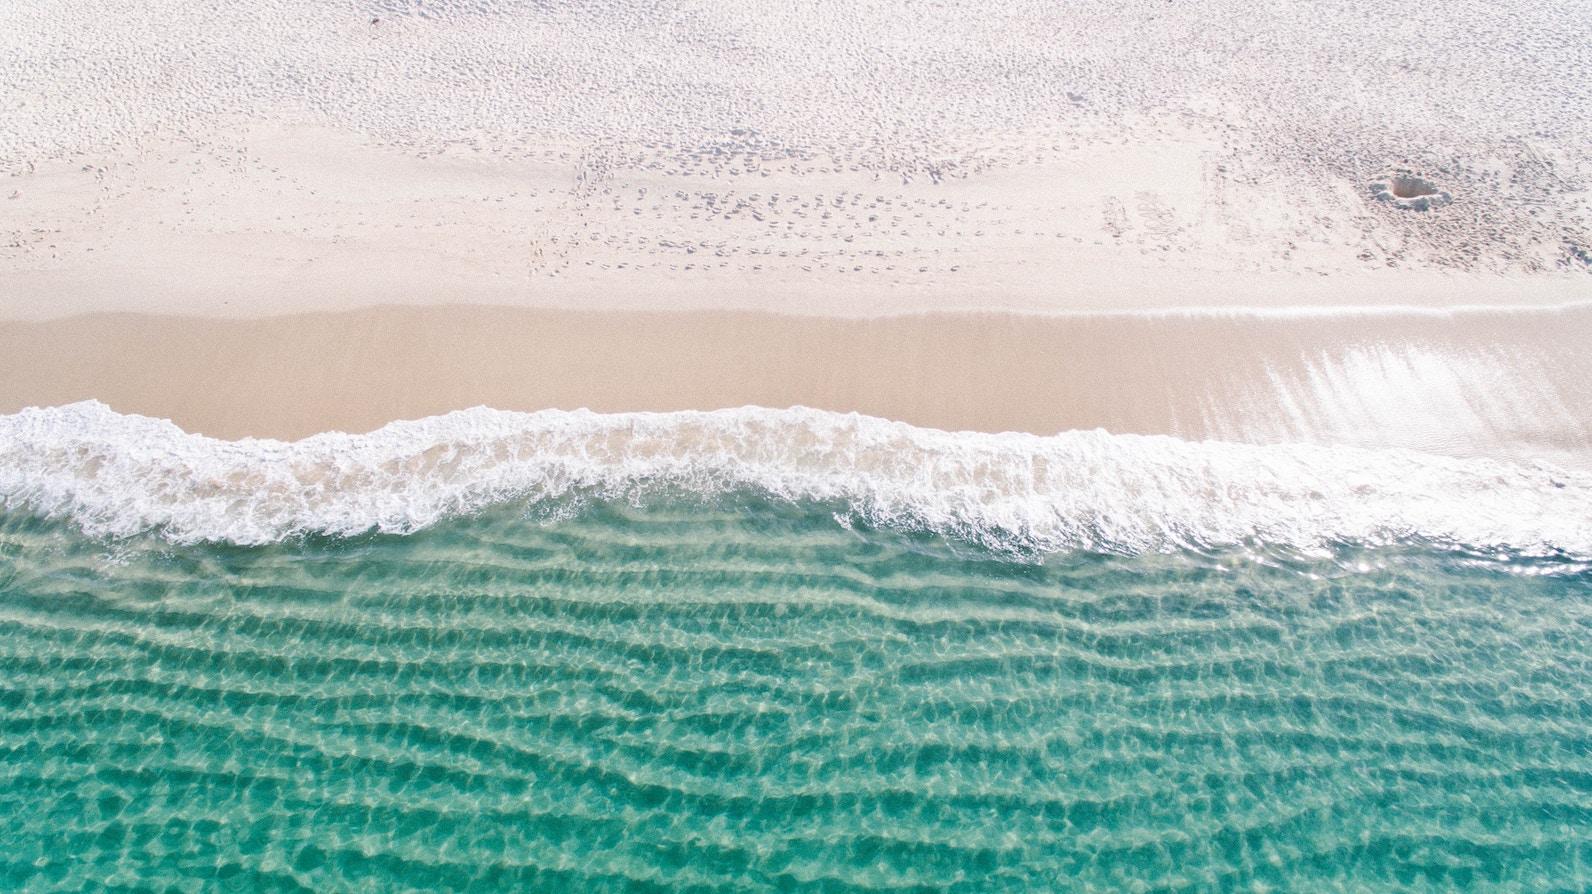 Nonfiction beach reads